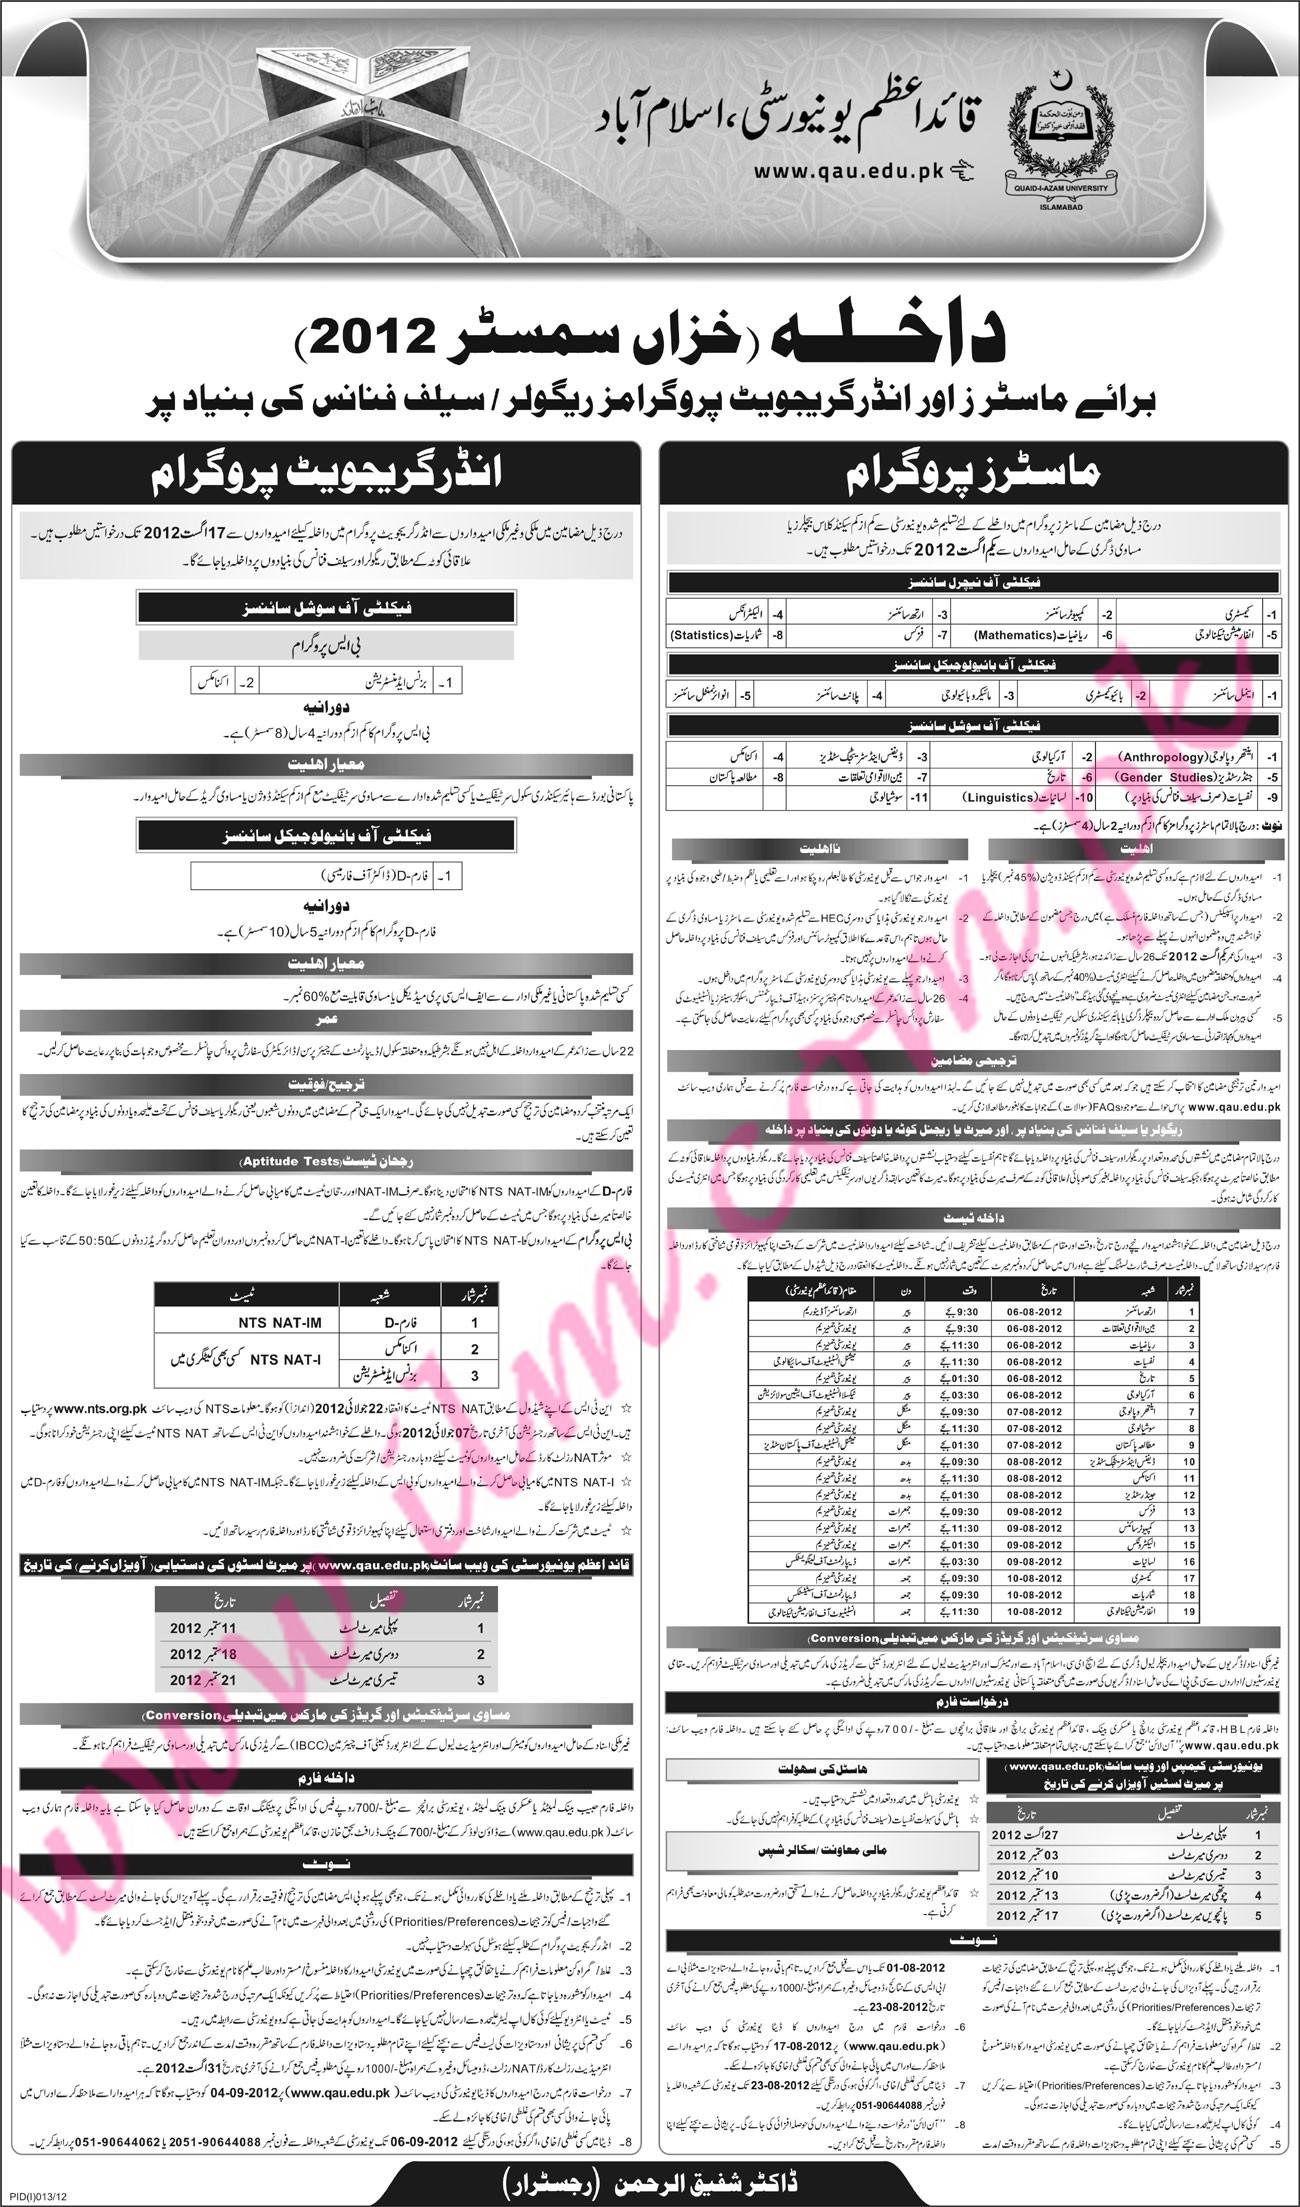 Quaid-e-Azam University Islamabad Admissions Fall 2012